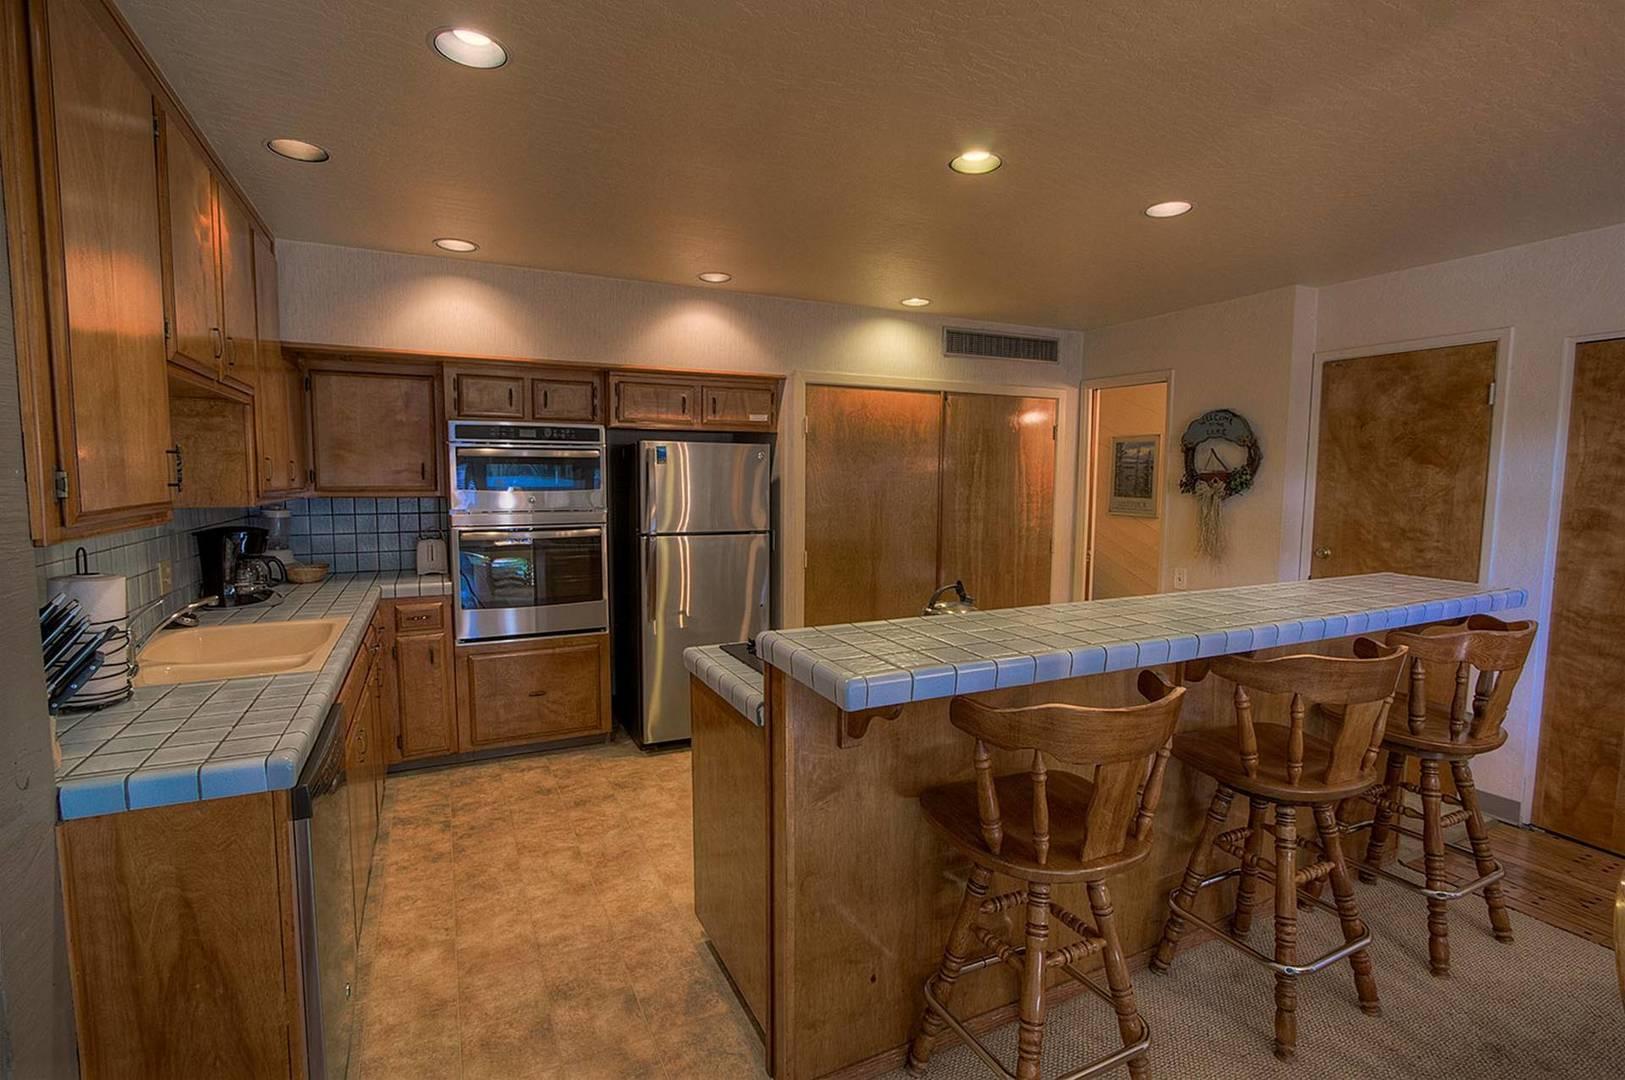 llc0804 kitchen